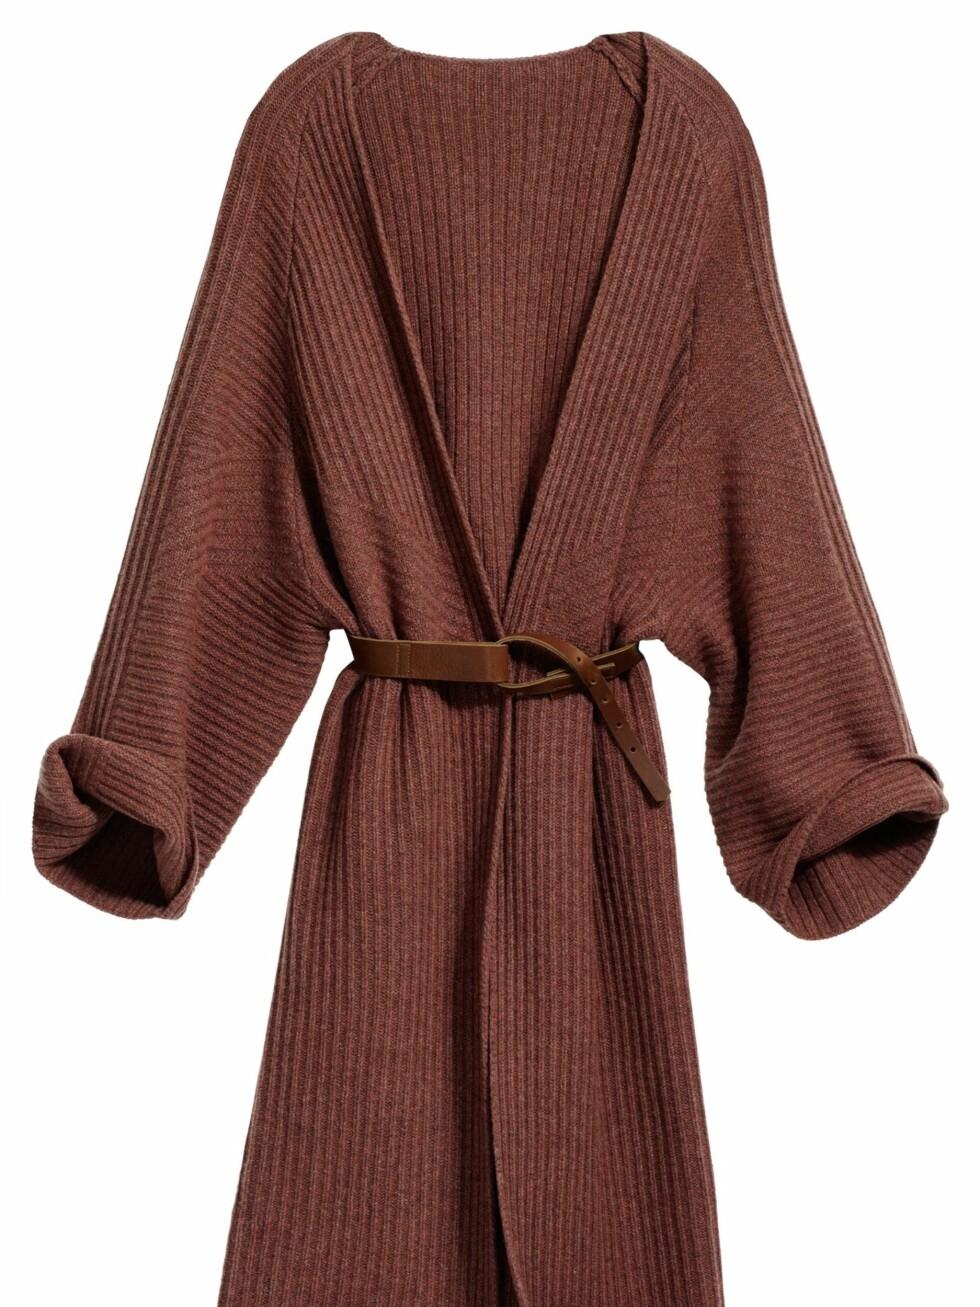 Lang cardigan i høstens it-farge, rust, kr 599. Foto: Produsenten